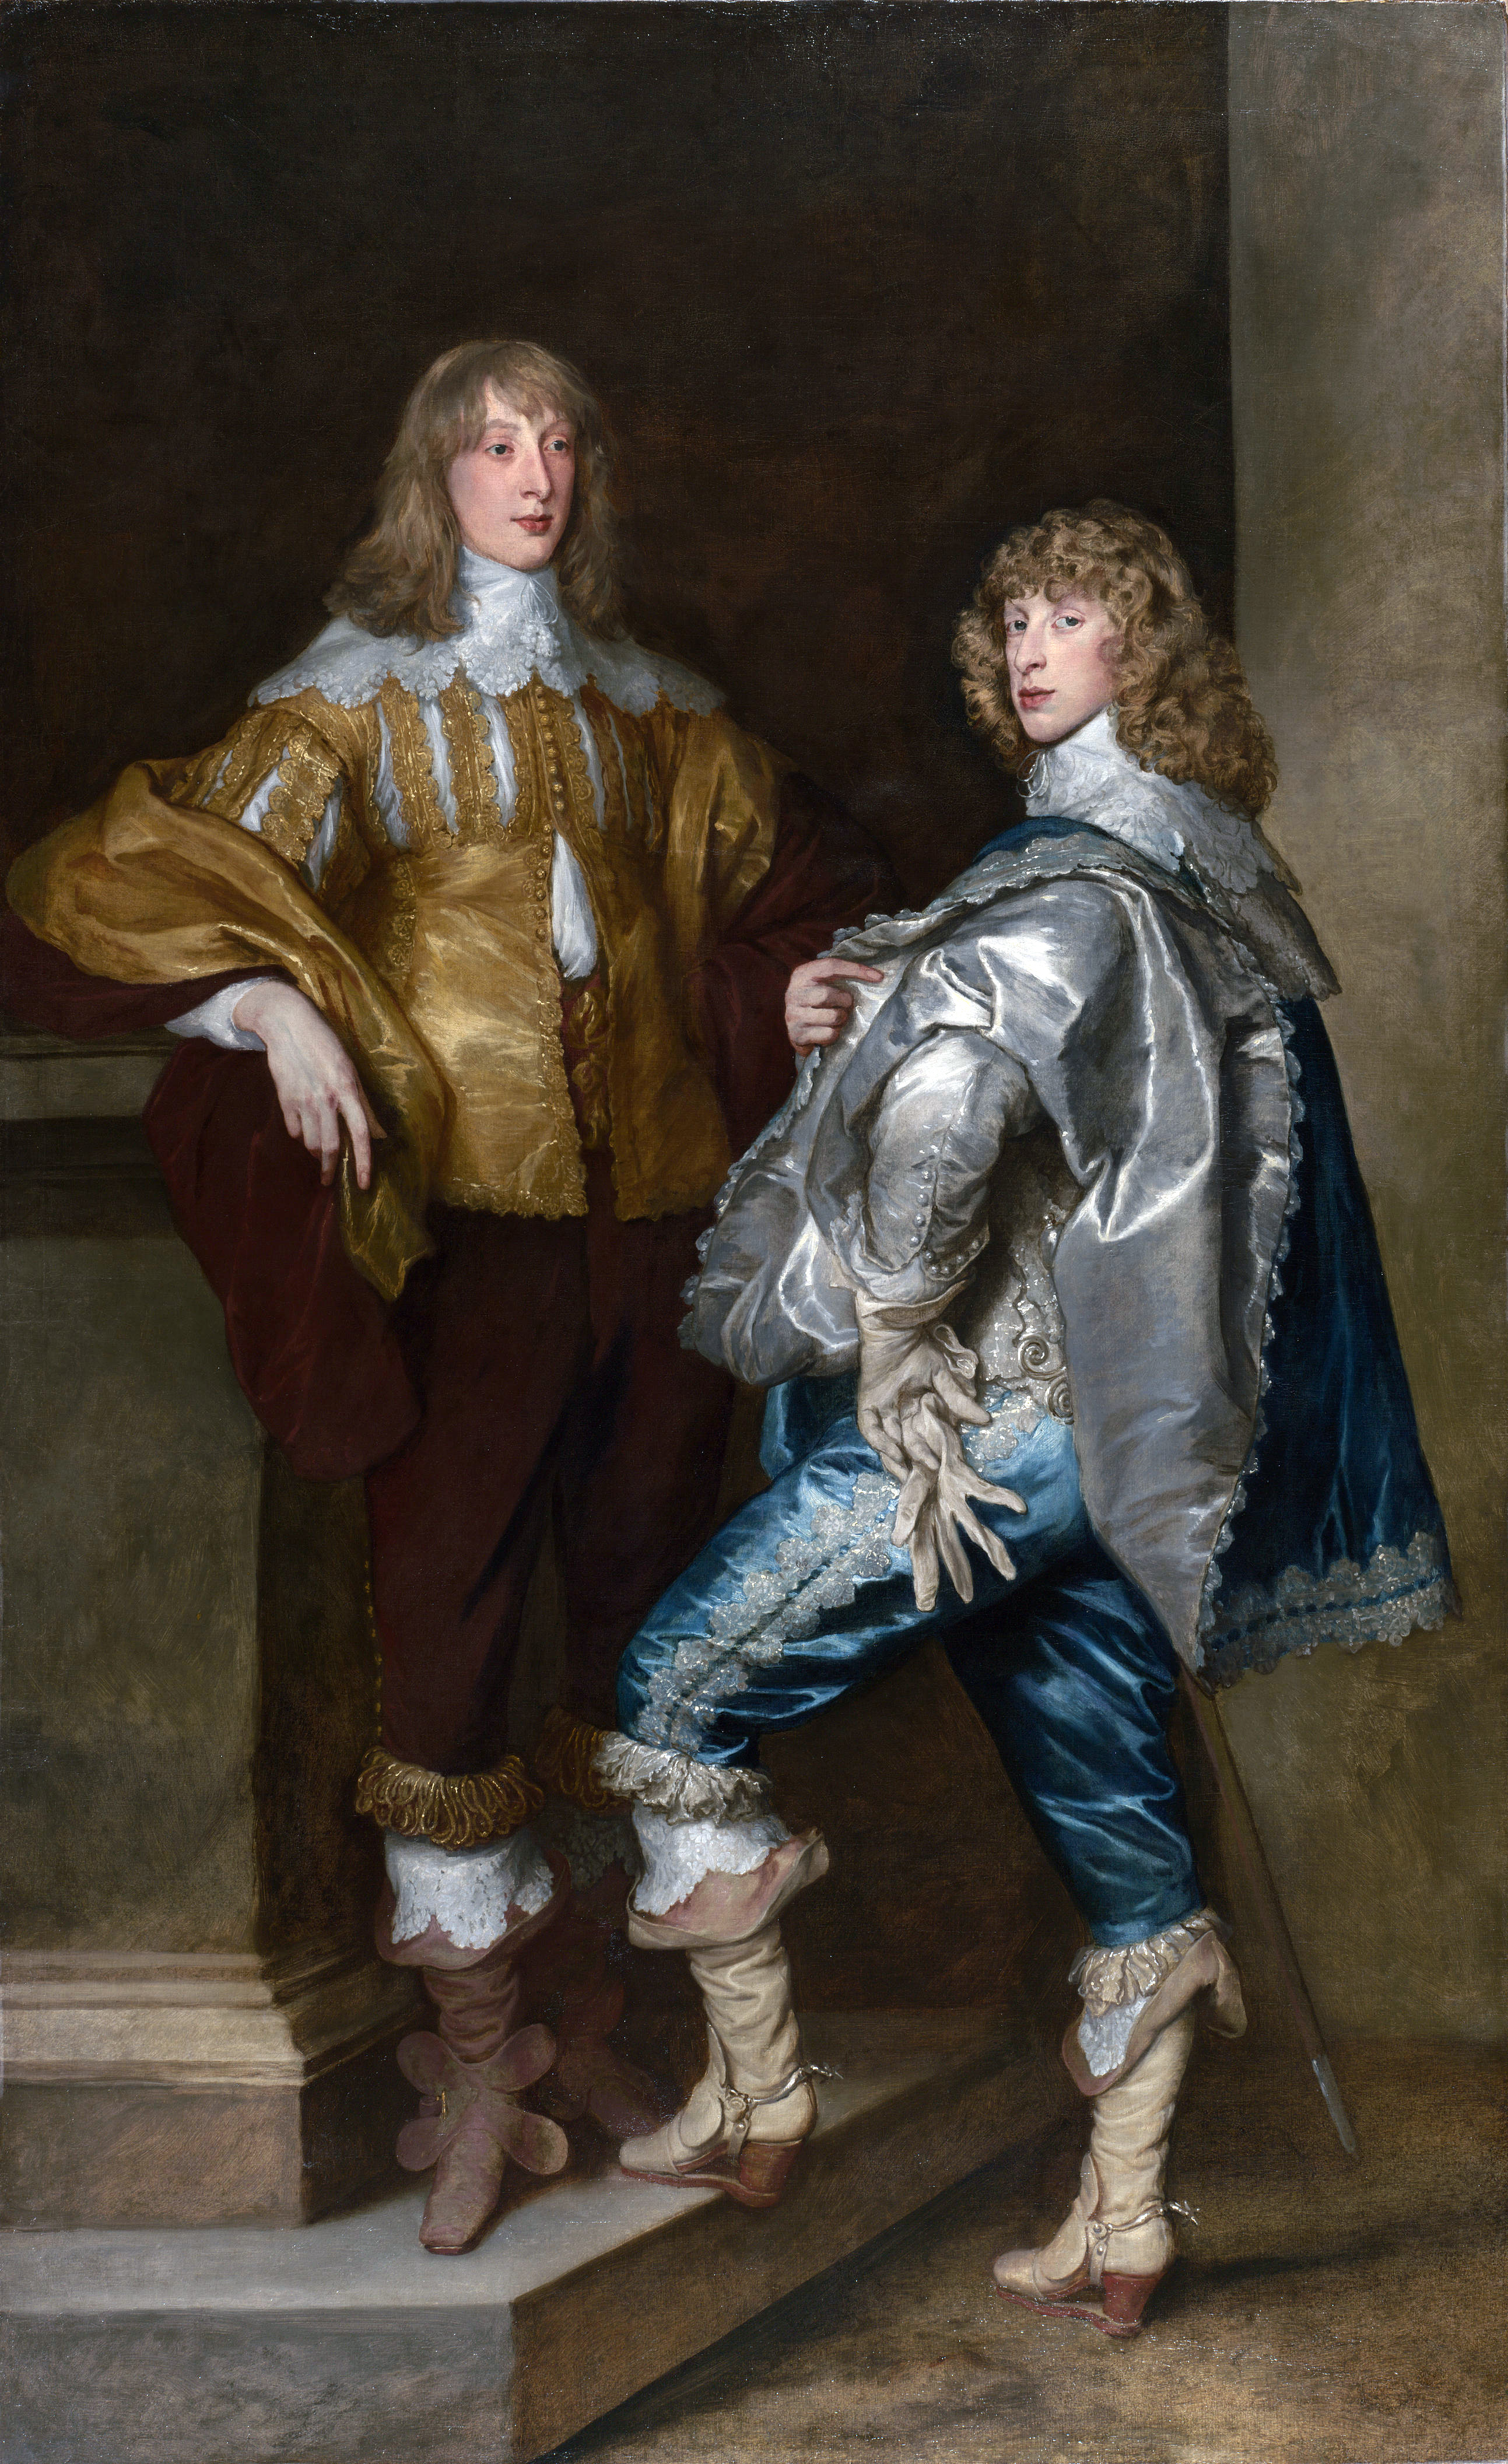 ¿Quién quiere jugar al gatarte? - Página 5 Sir-Anthony-van-Dyck-Lord-John-Stuart-and-His-Brother-Lord-Bernard-Stuart